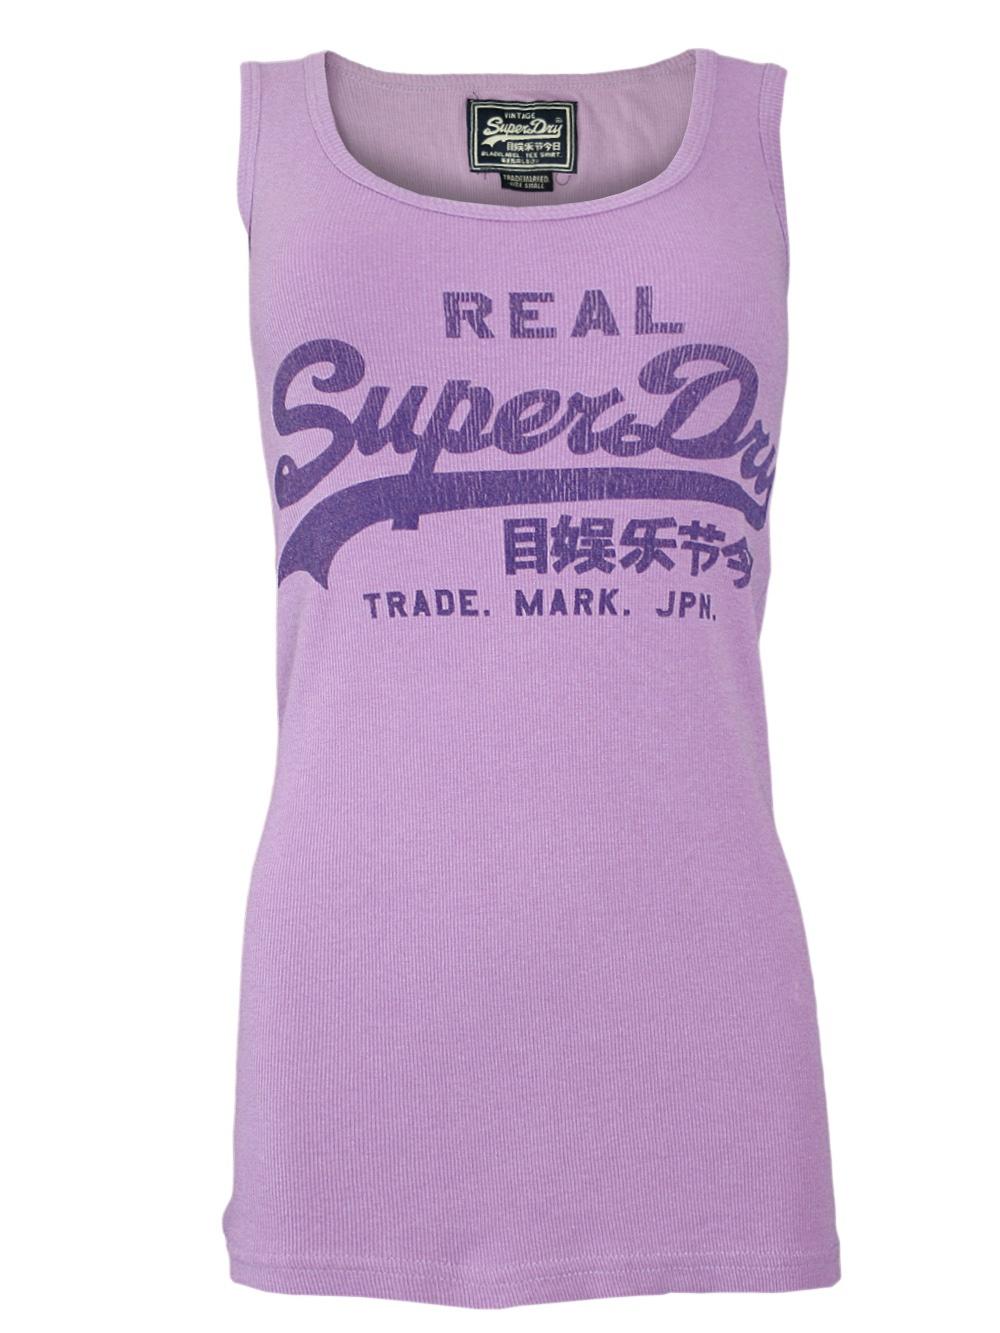 online retailer 57ea2 a3672 Damen Tank Top Real Superdry